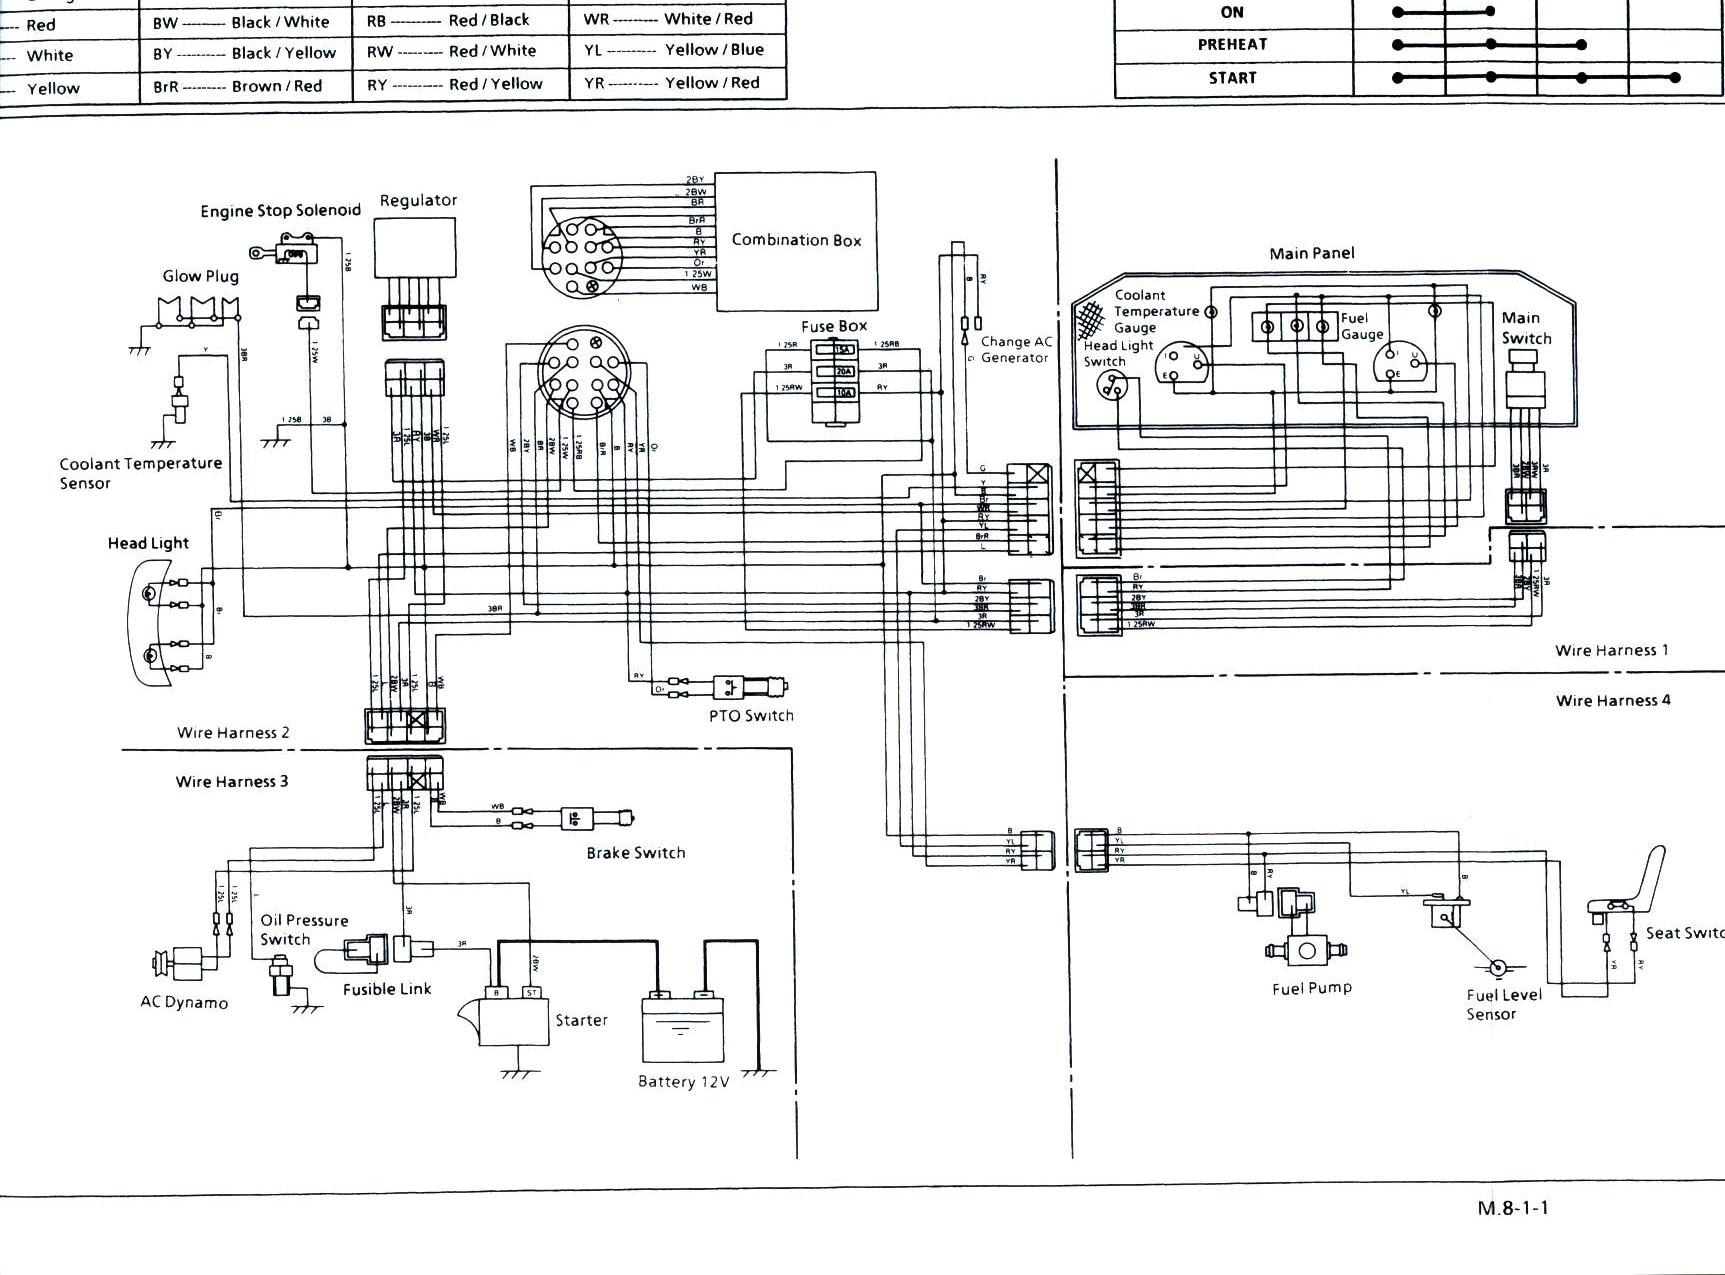 kubota g1800 wiring diagram kubota automotive wiring diagrams description attachment kubota g wiring diagram